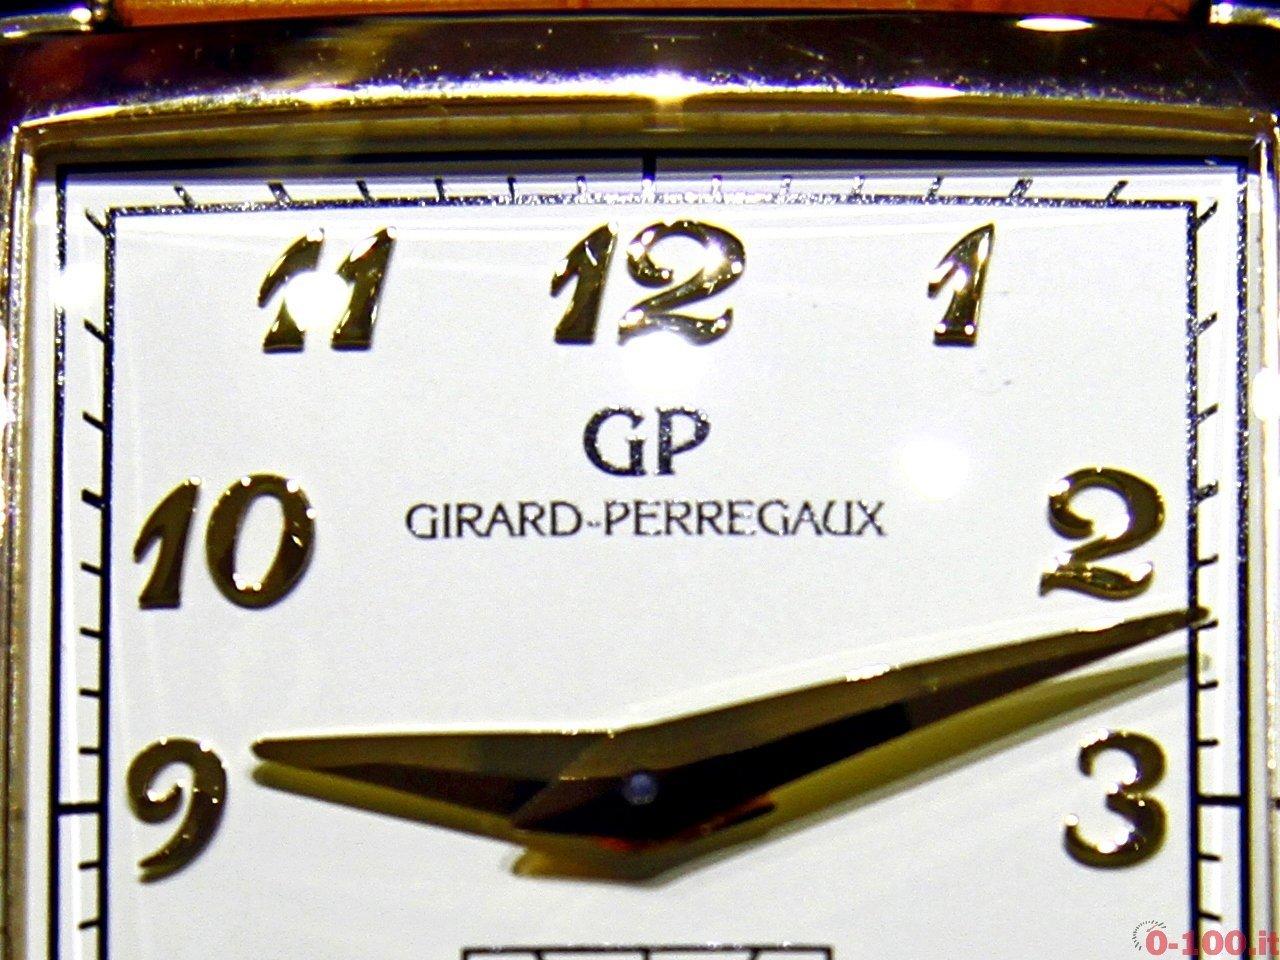 baselworld-2015-girard-perregaux-vintage-1945-70-0-100_4